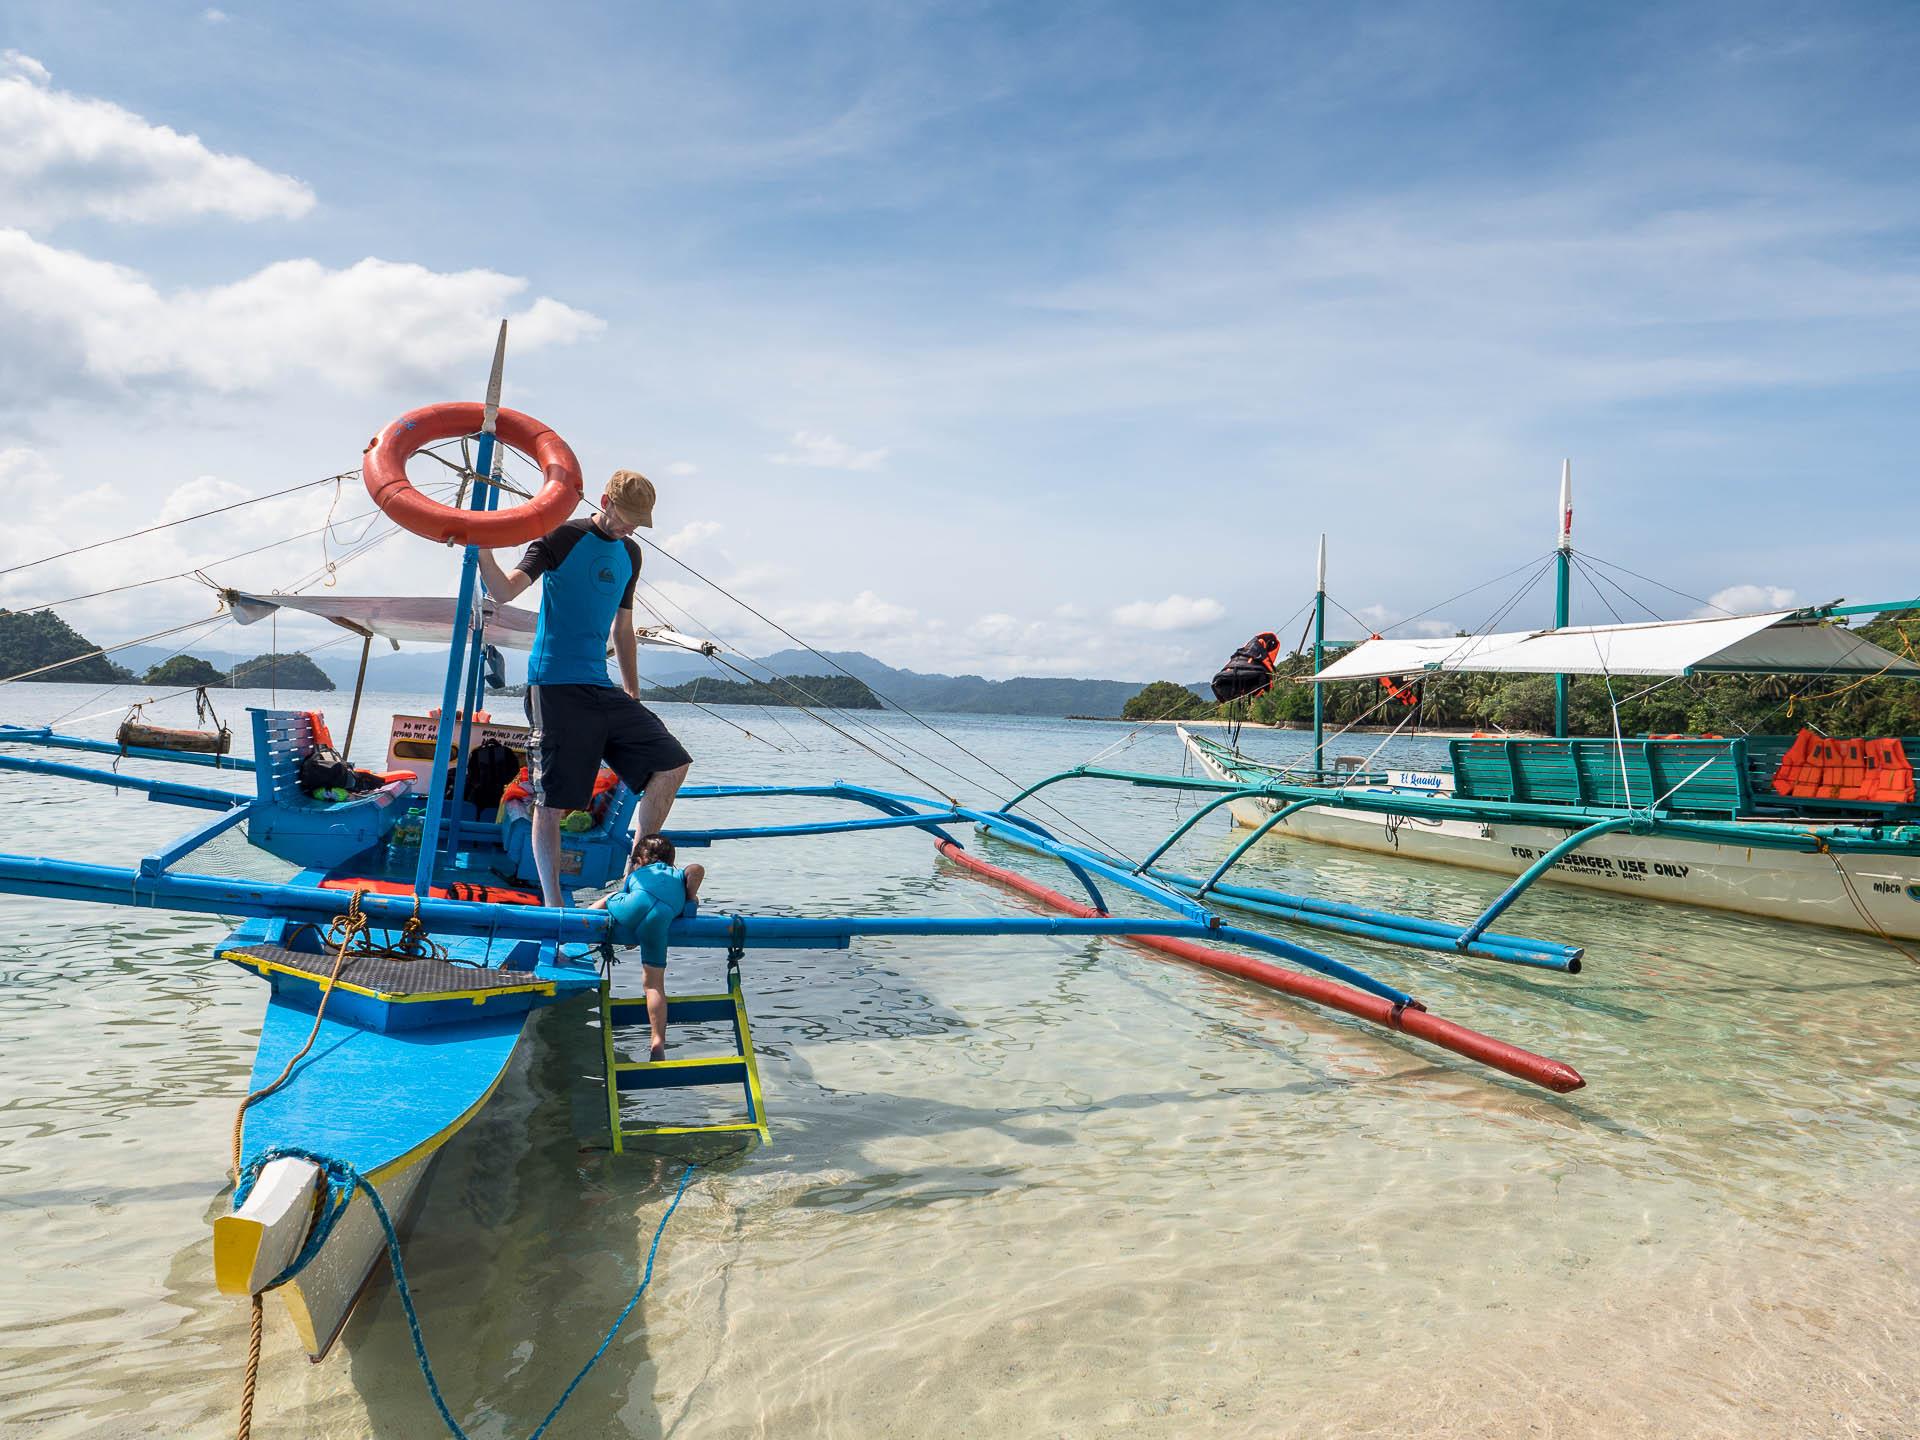 Port barton plage bangka - Les globe blogueurs - blog voyage nature